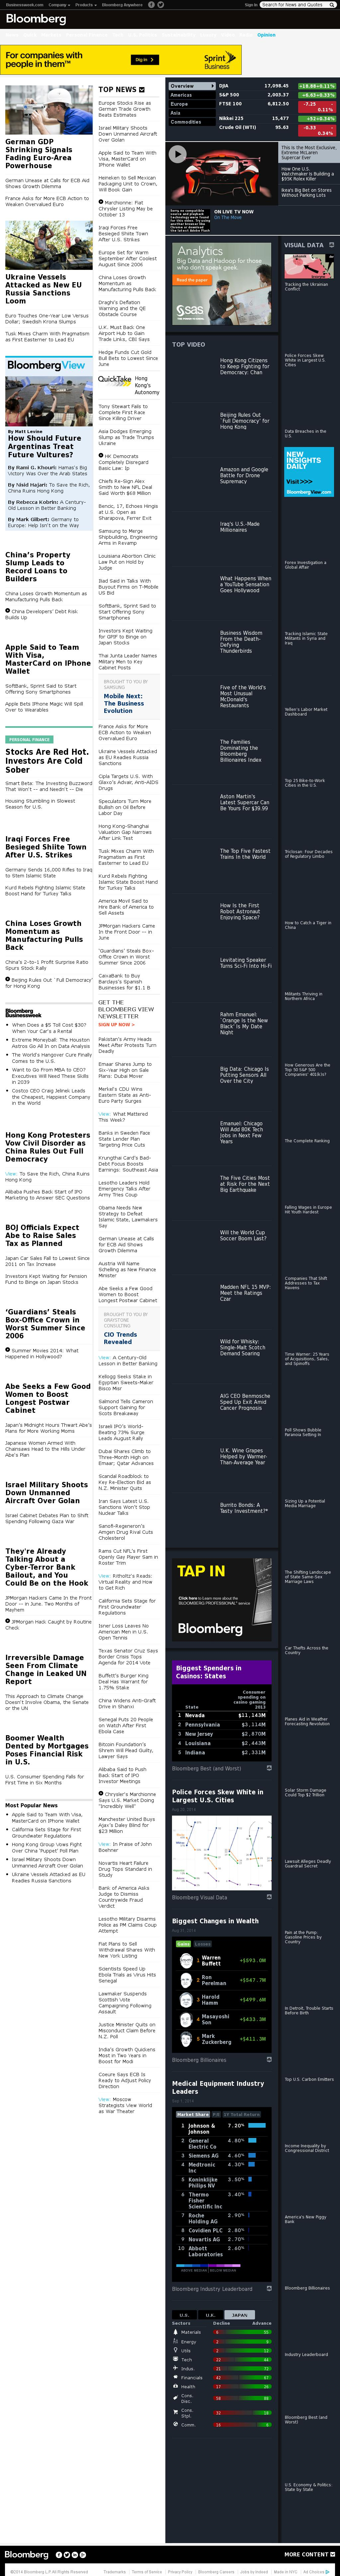 Bloomberg at Monday Sept. 1, 2014, 8:01 a.m. UTC